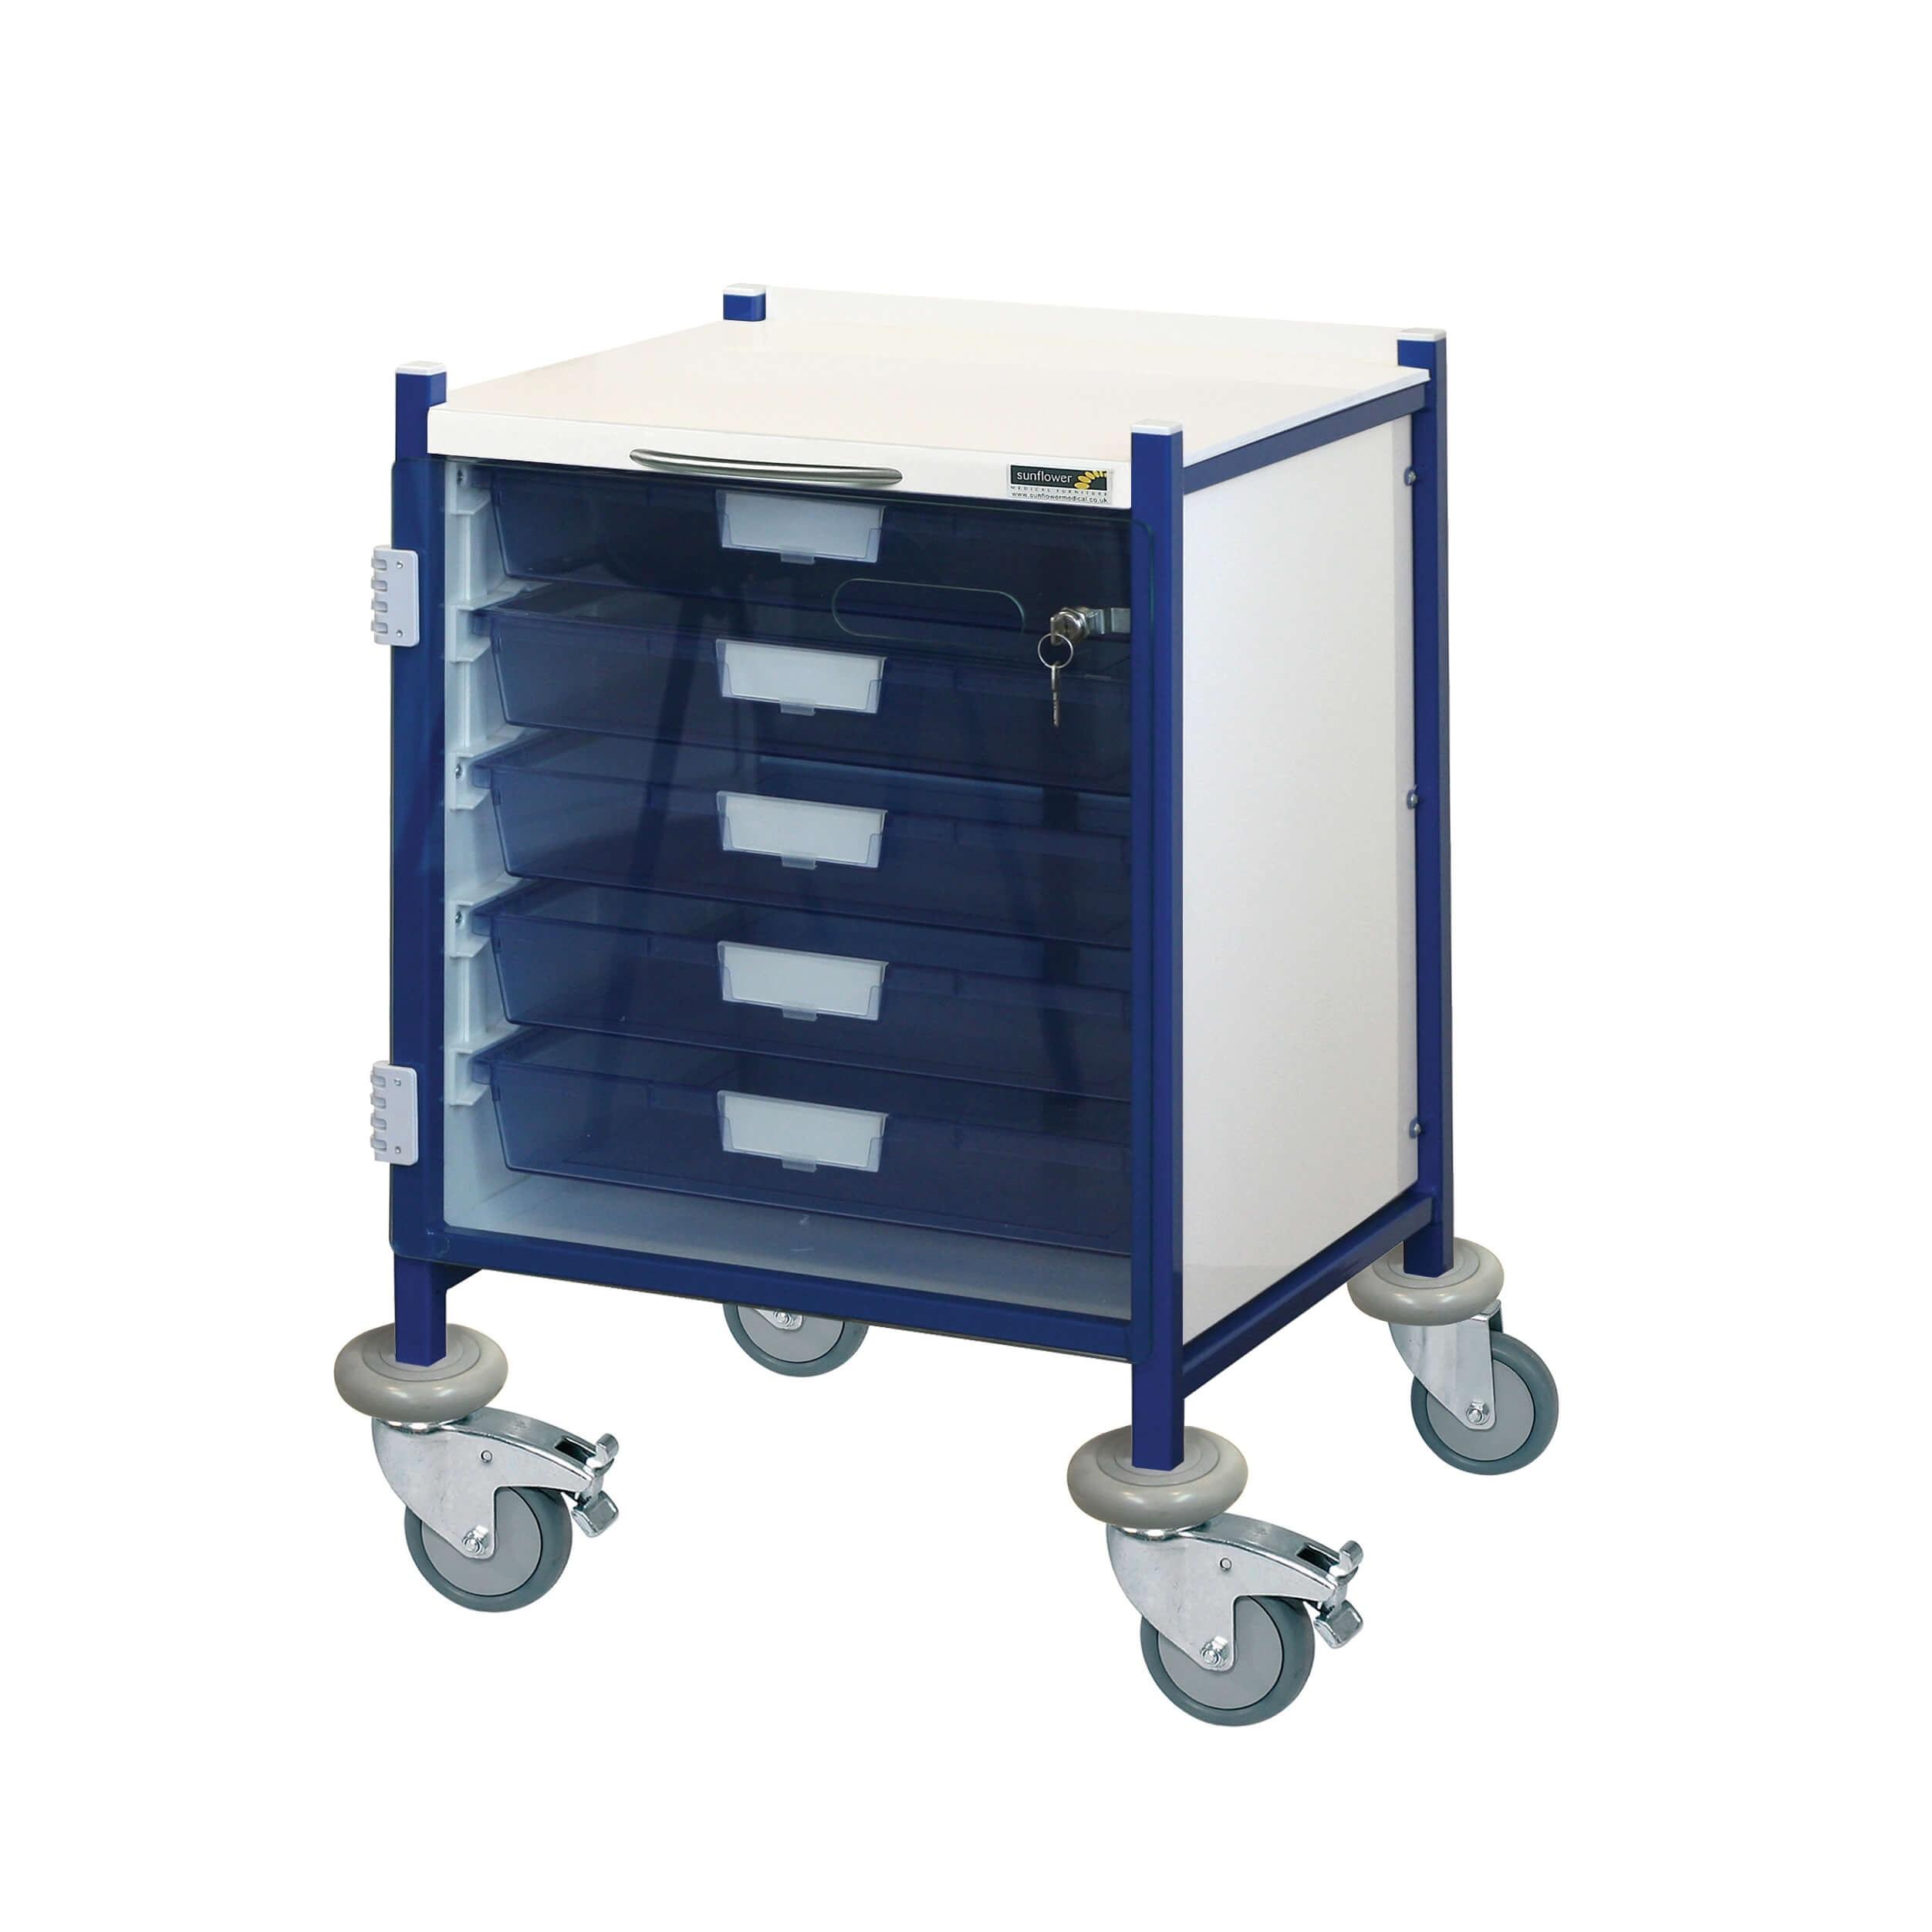 VISTA 40 Clinical Trolley 5 Single Depth Trays with Locking Door | Medical Supermarket